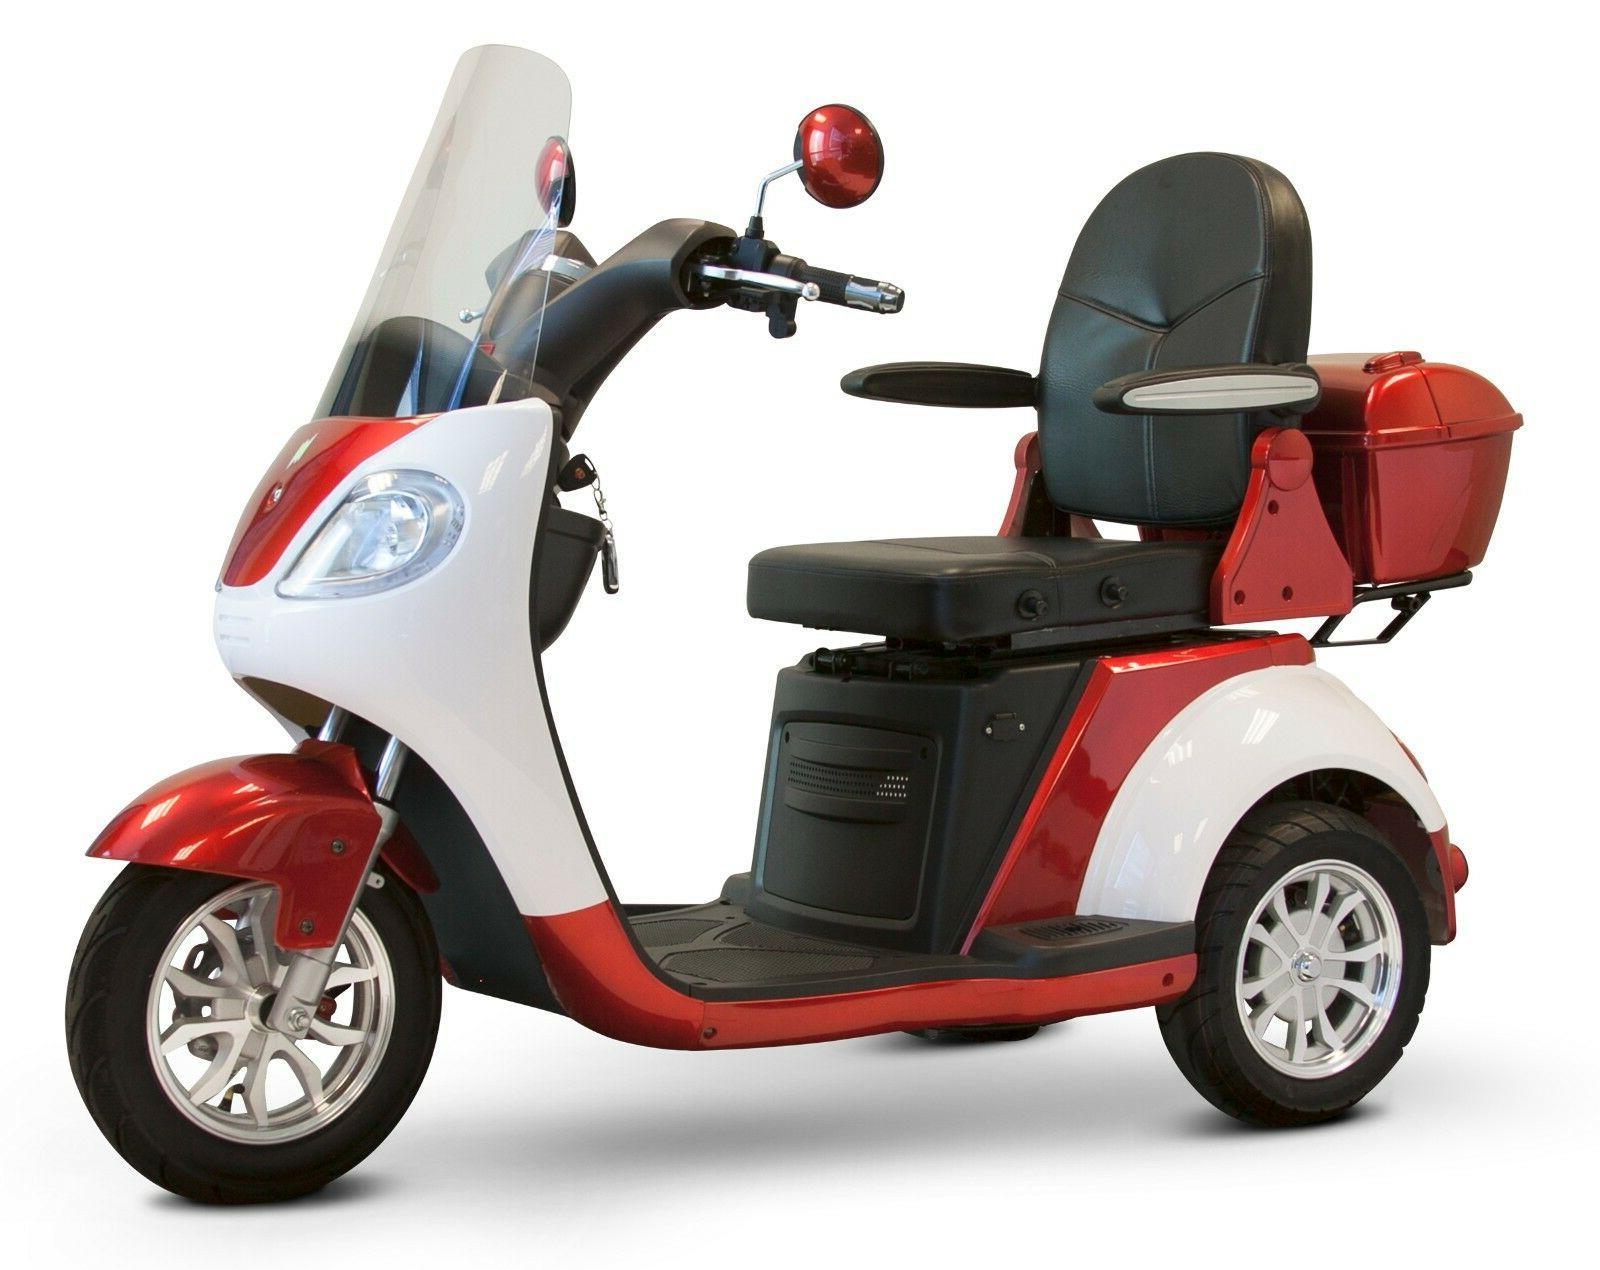 RED EW-42 3 Wheel 500 MPH